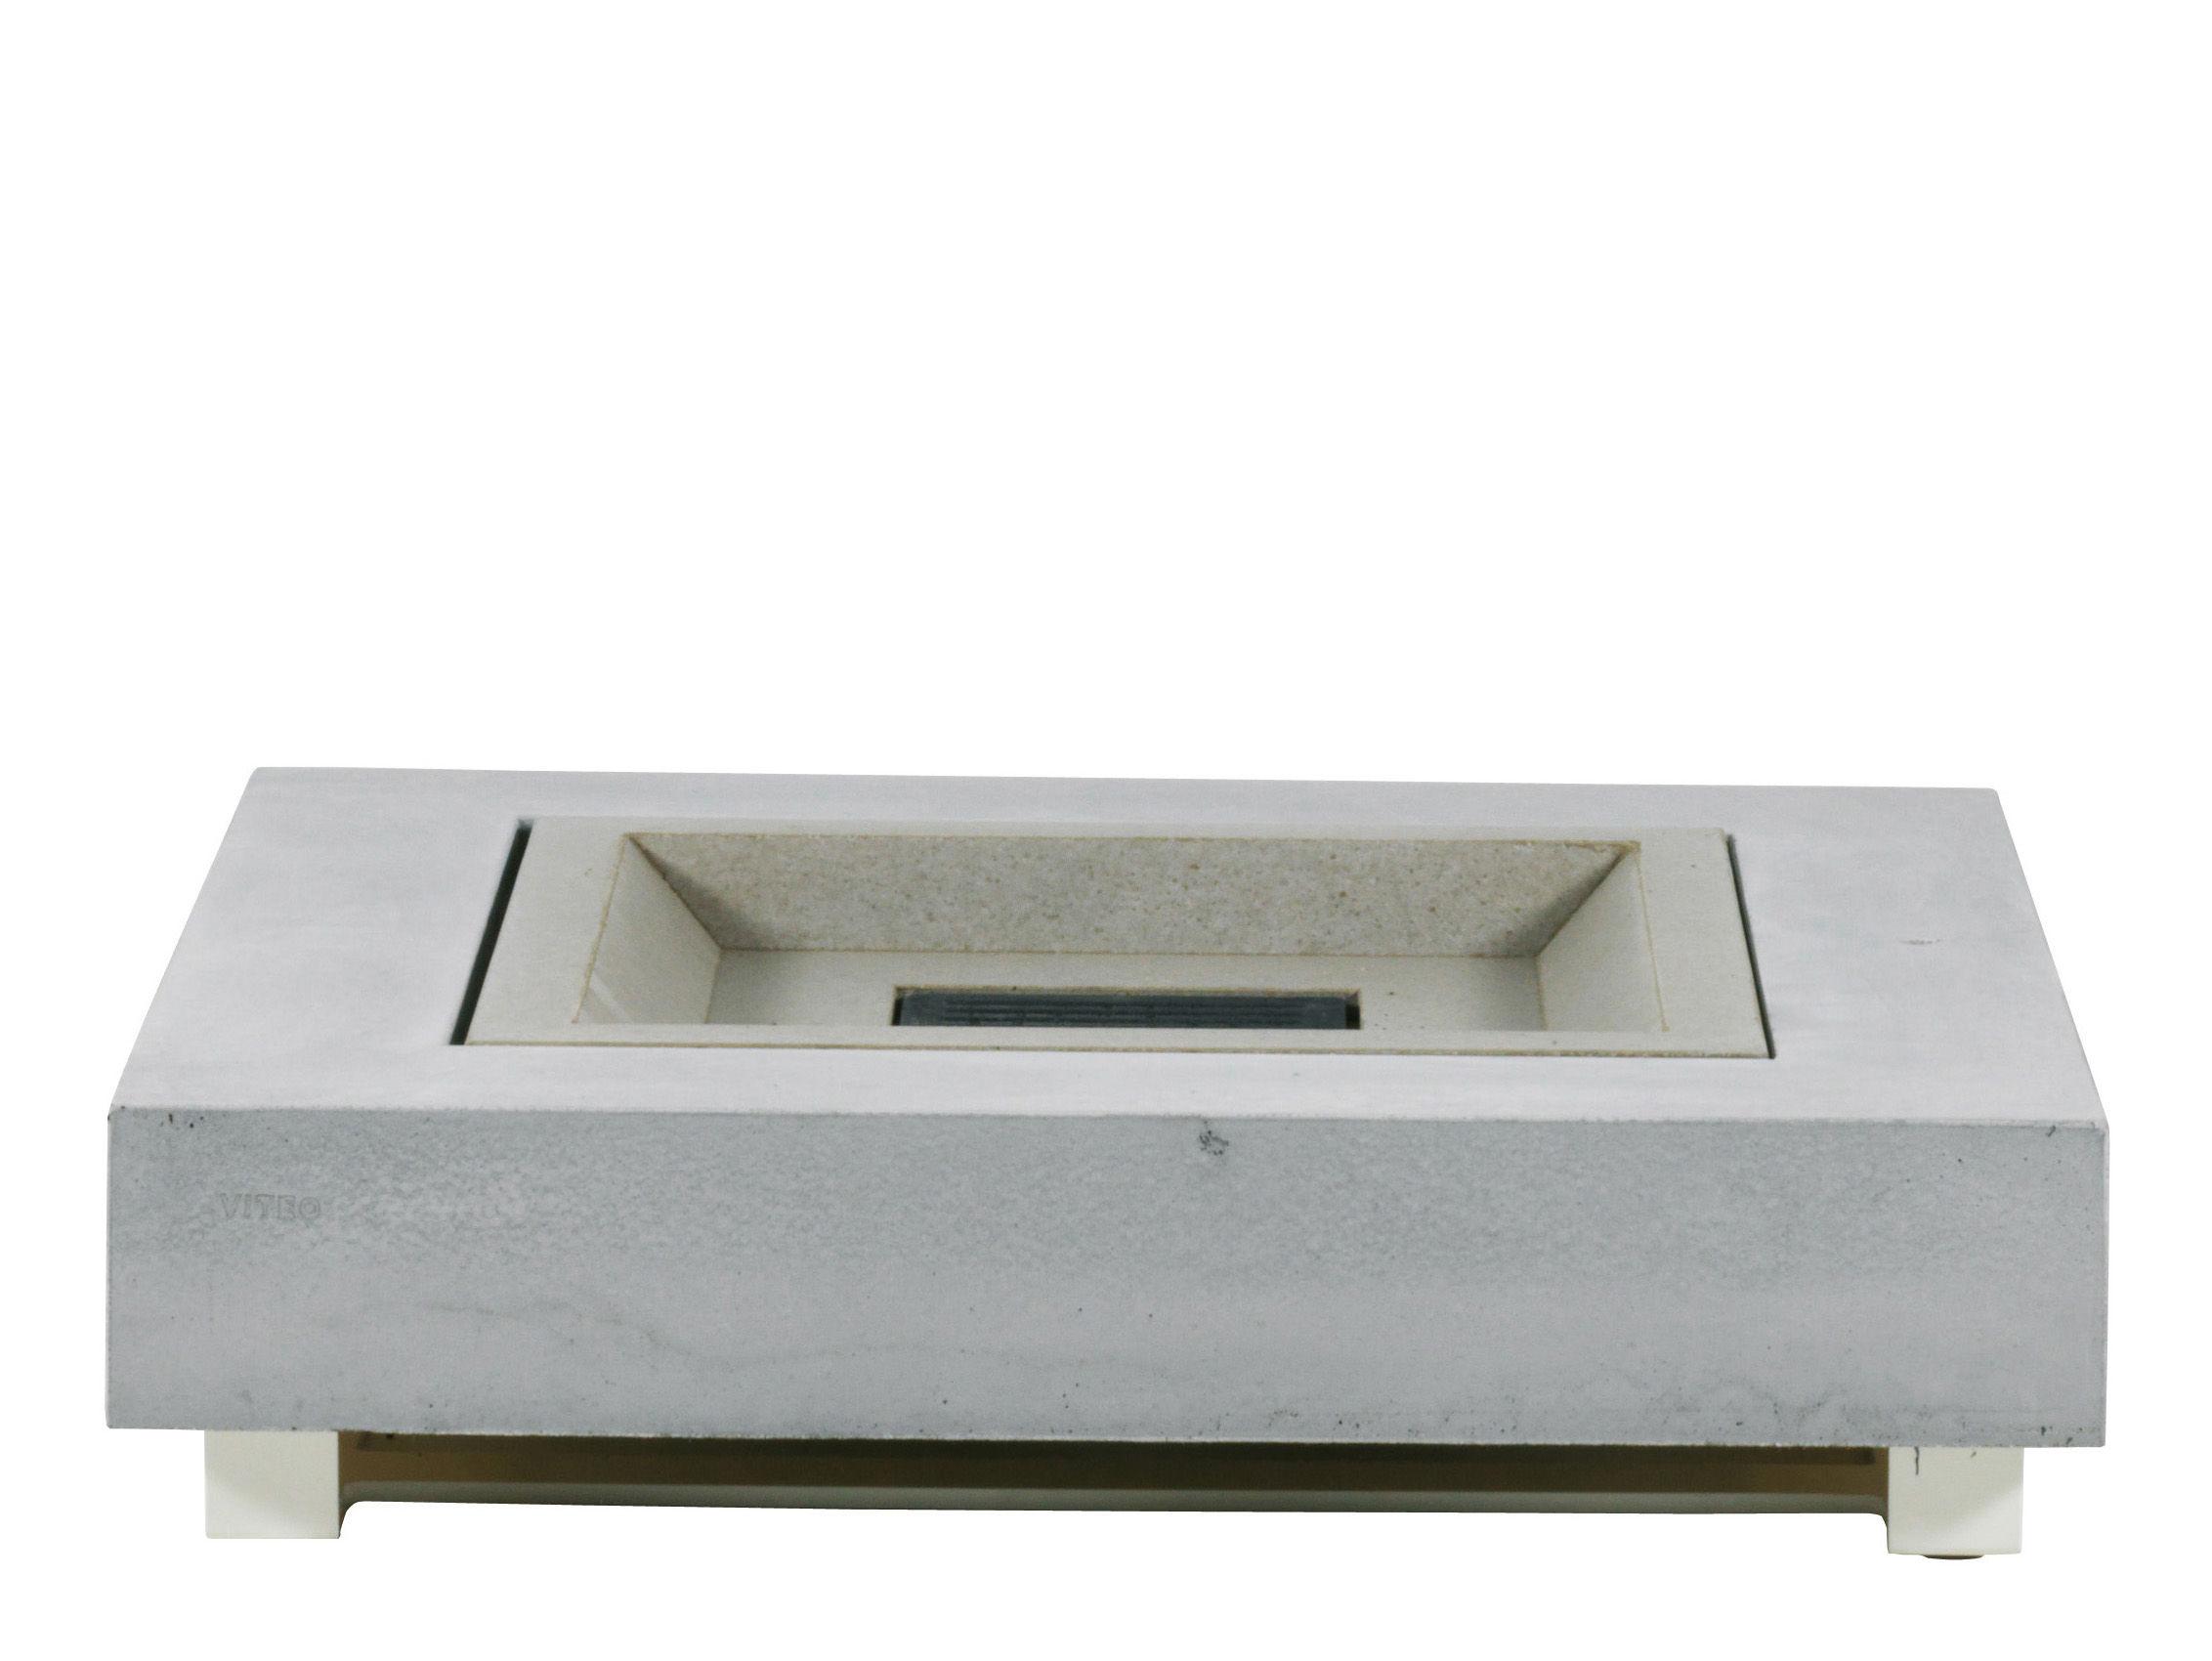 table basse pure brasero b ton 90 x 90 cm table. Black Bedroom Furniture Sets. Home Design Ideas